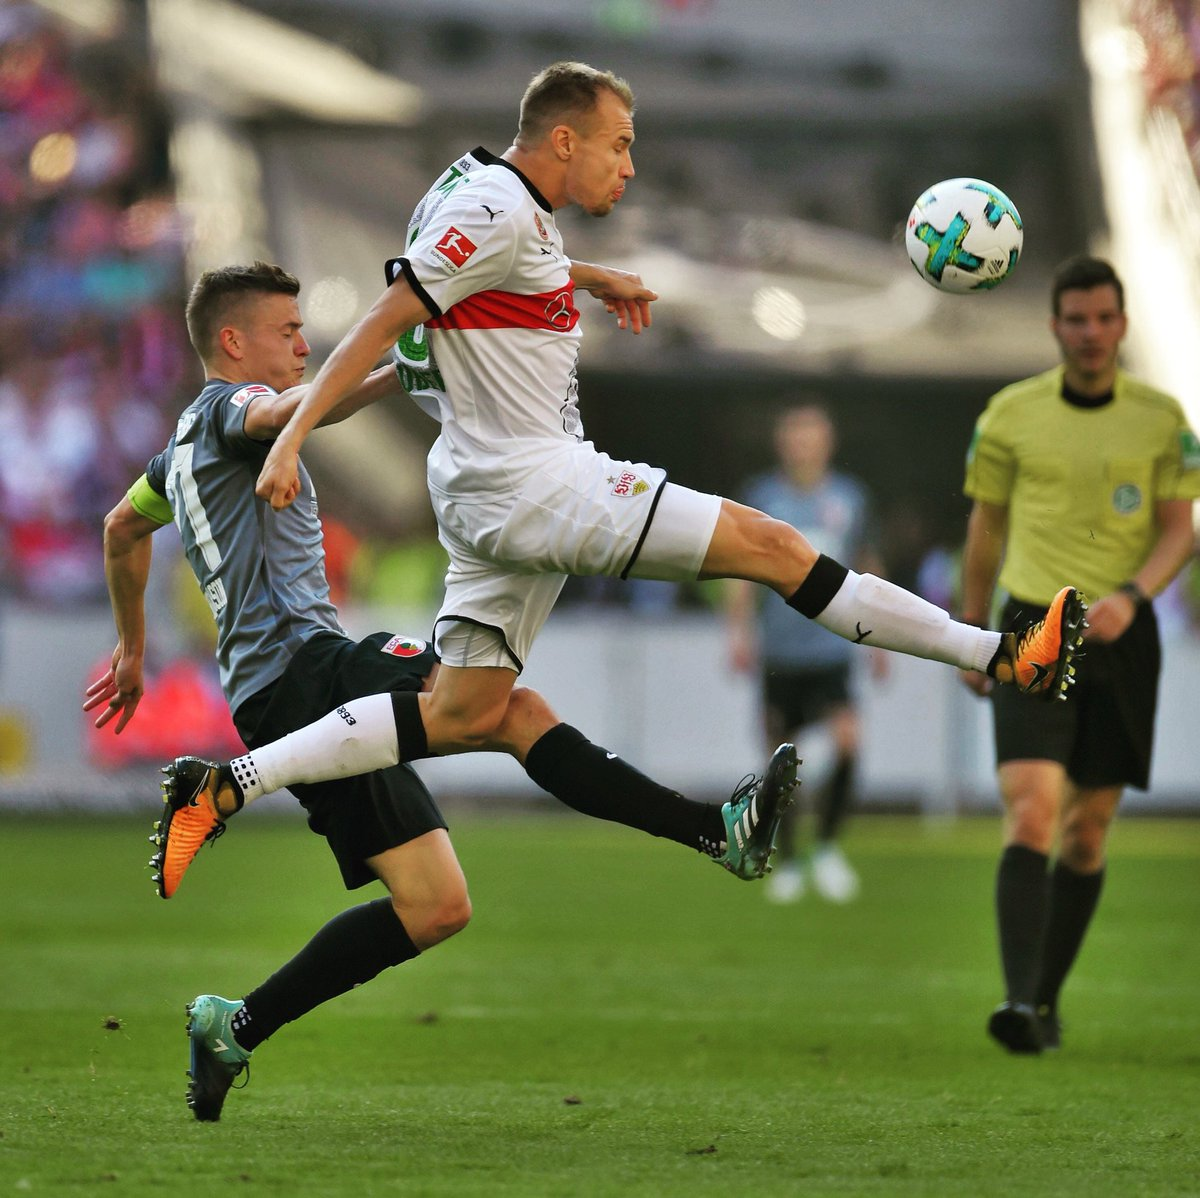 Jumping ahead 🤙🏼 #straightforward #nextgame #bundesliga @VfB https://t...